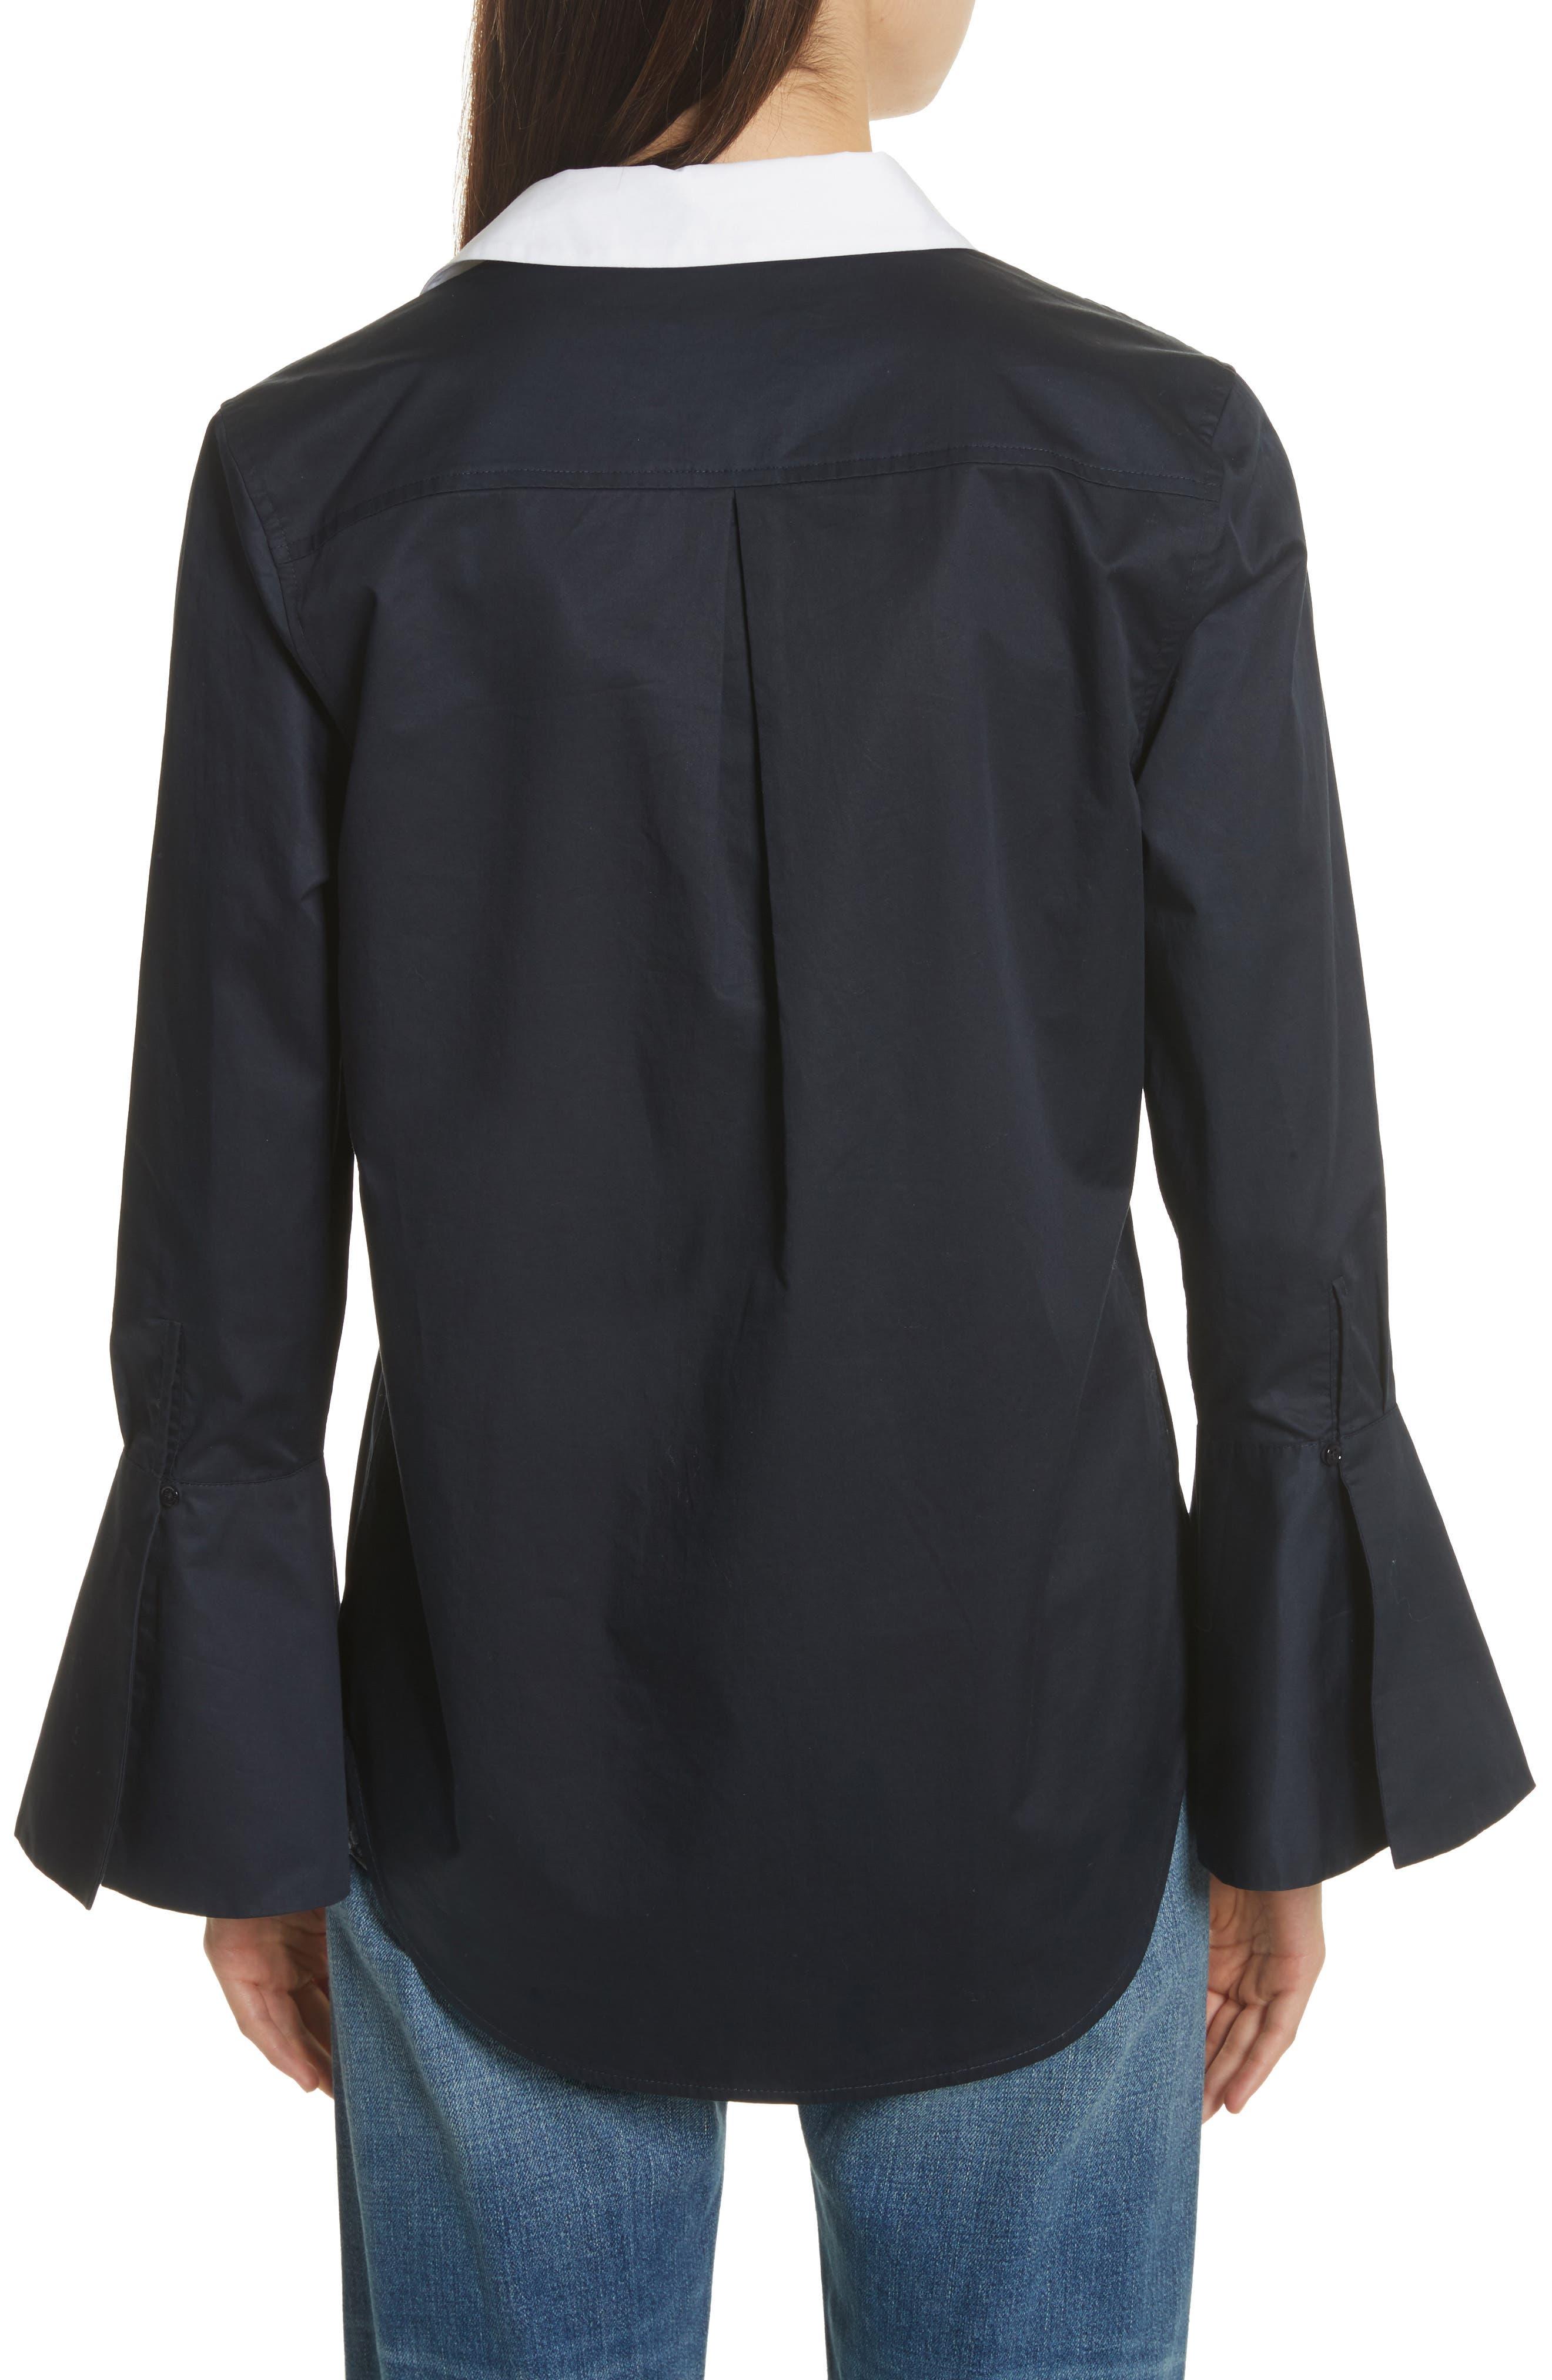 Darla Bell Cuff Shirt,                             Alternate thumbnail 4, color,